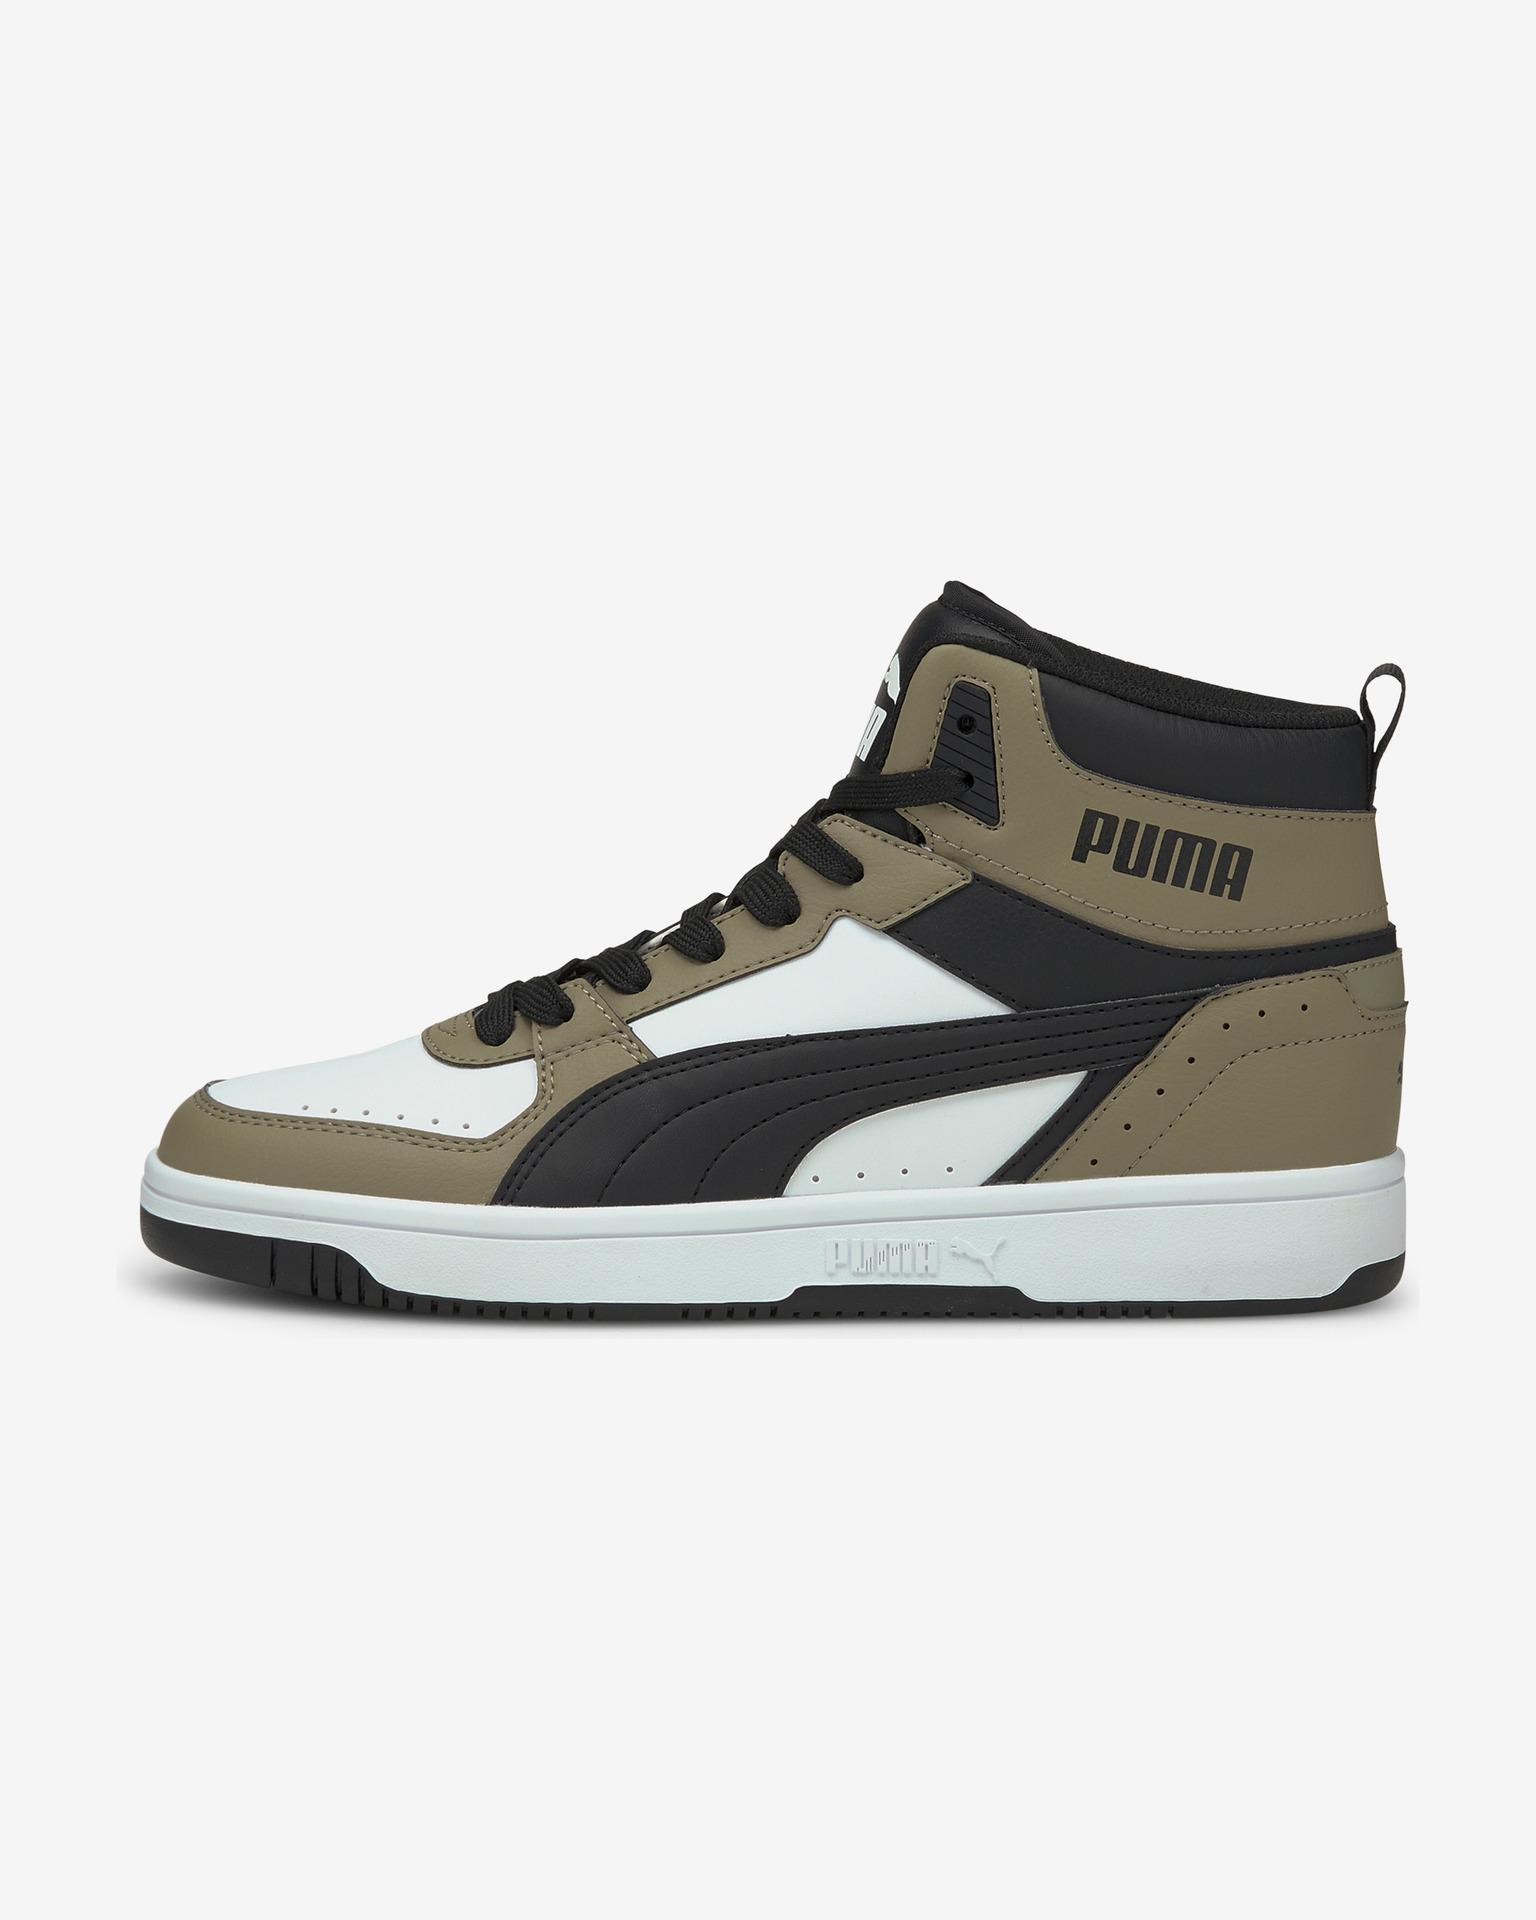 Puma - Rebound Joy Sneakers Bibloo.com